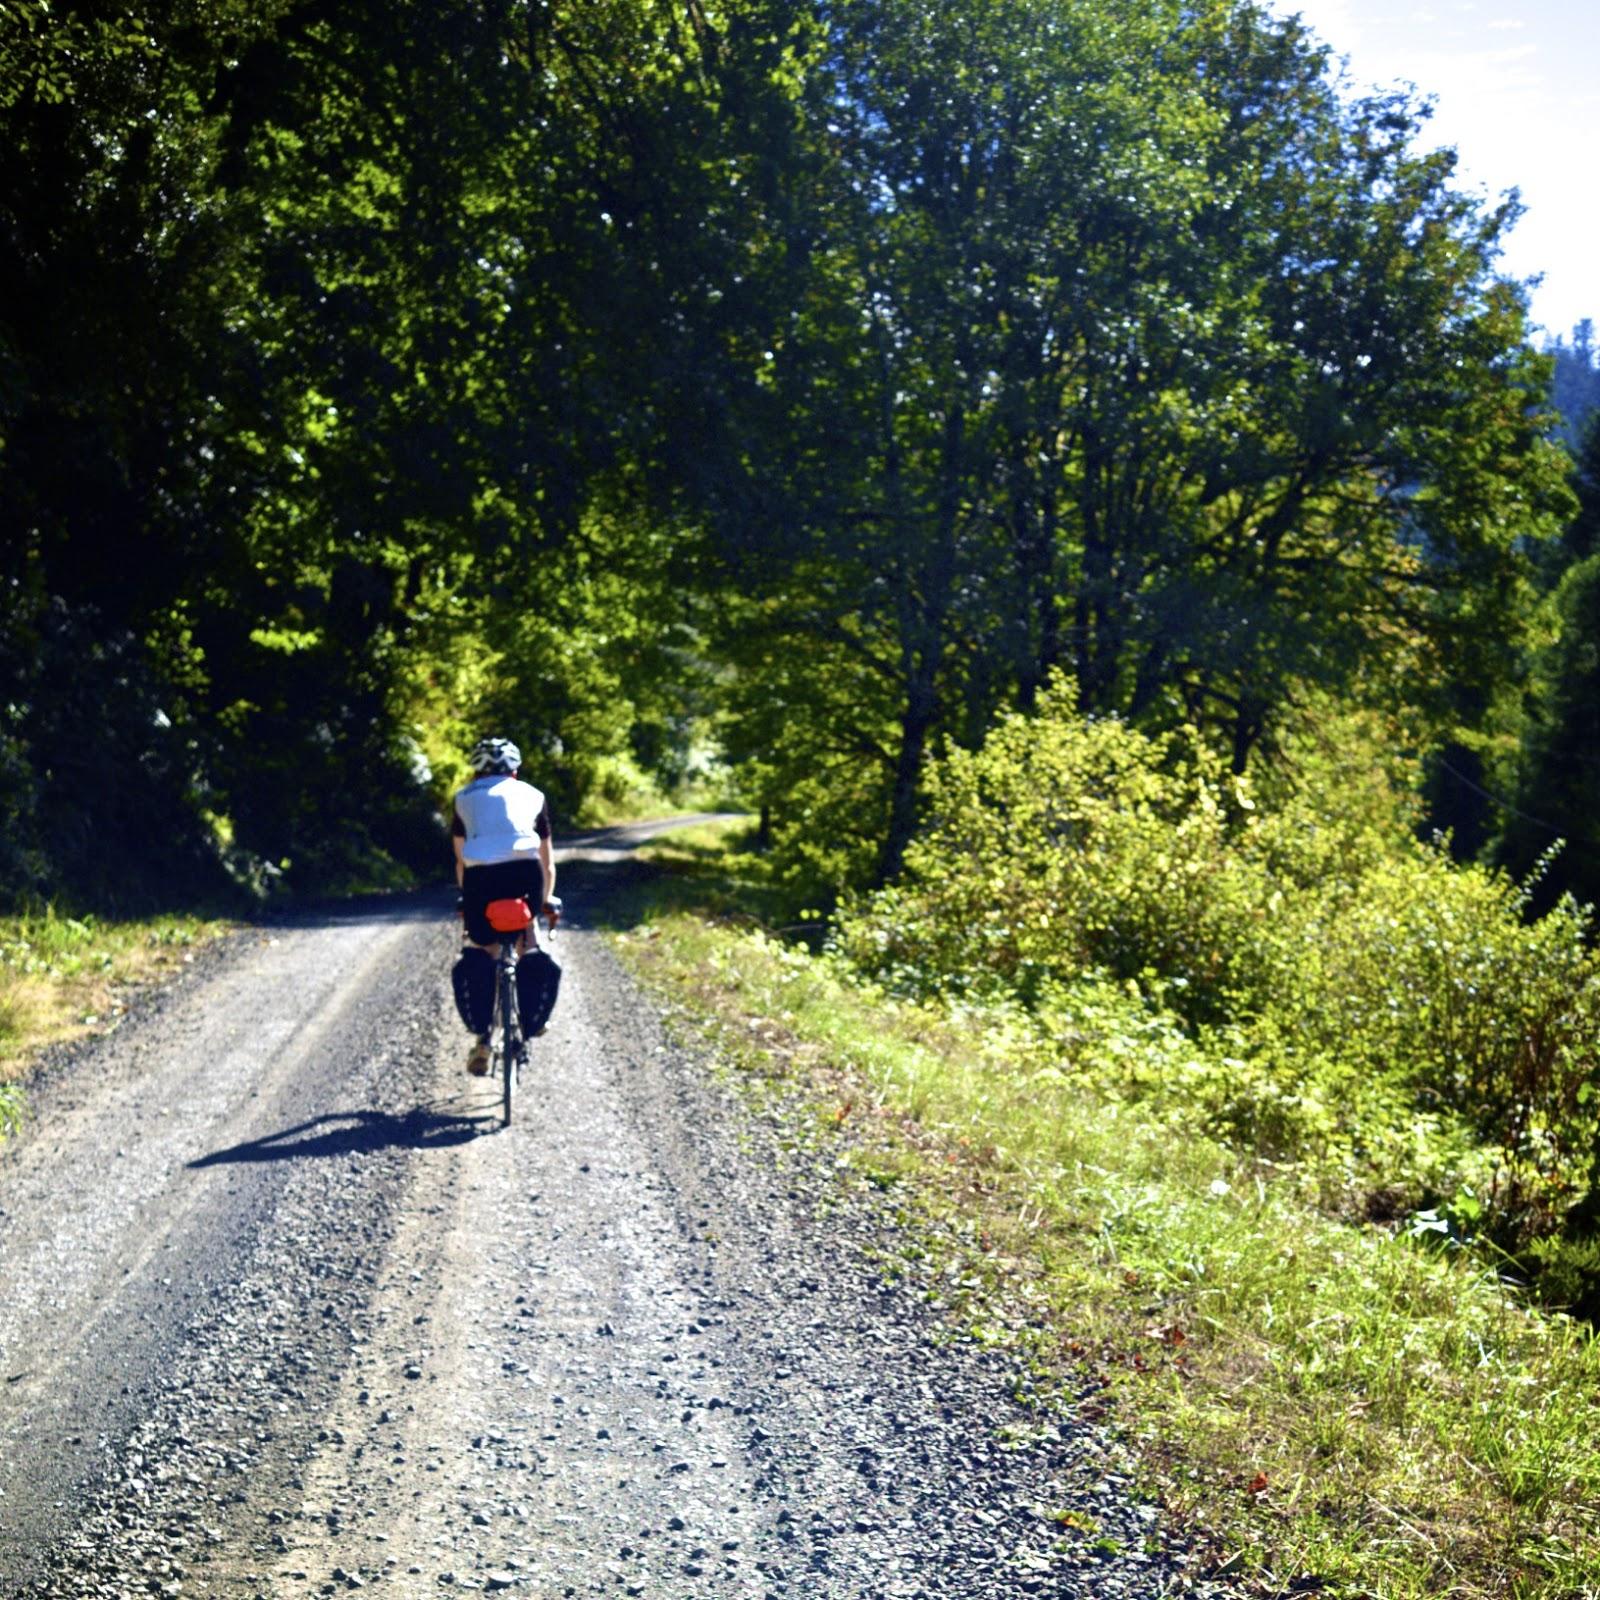 The Blayleys: Oregon - To Waldport